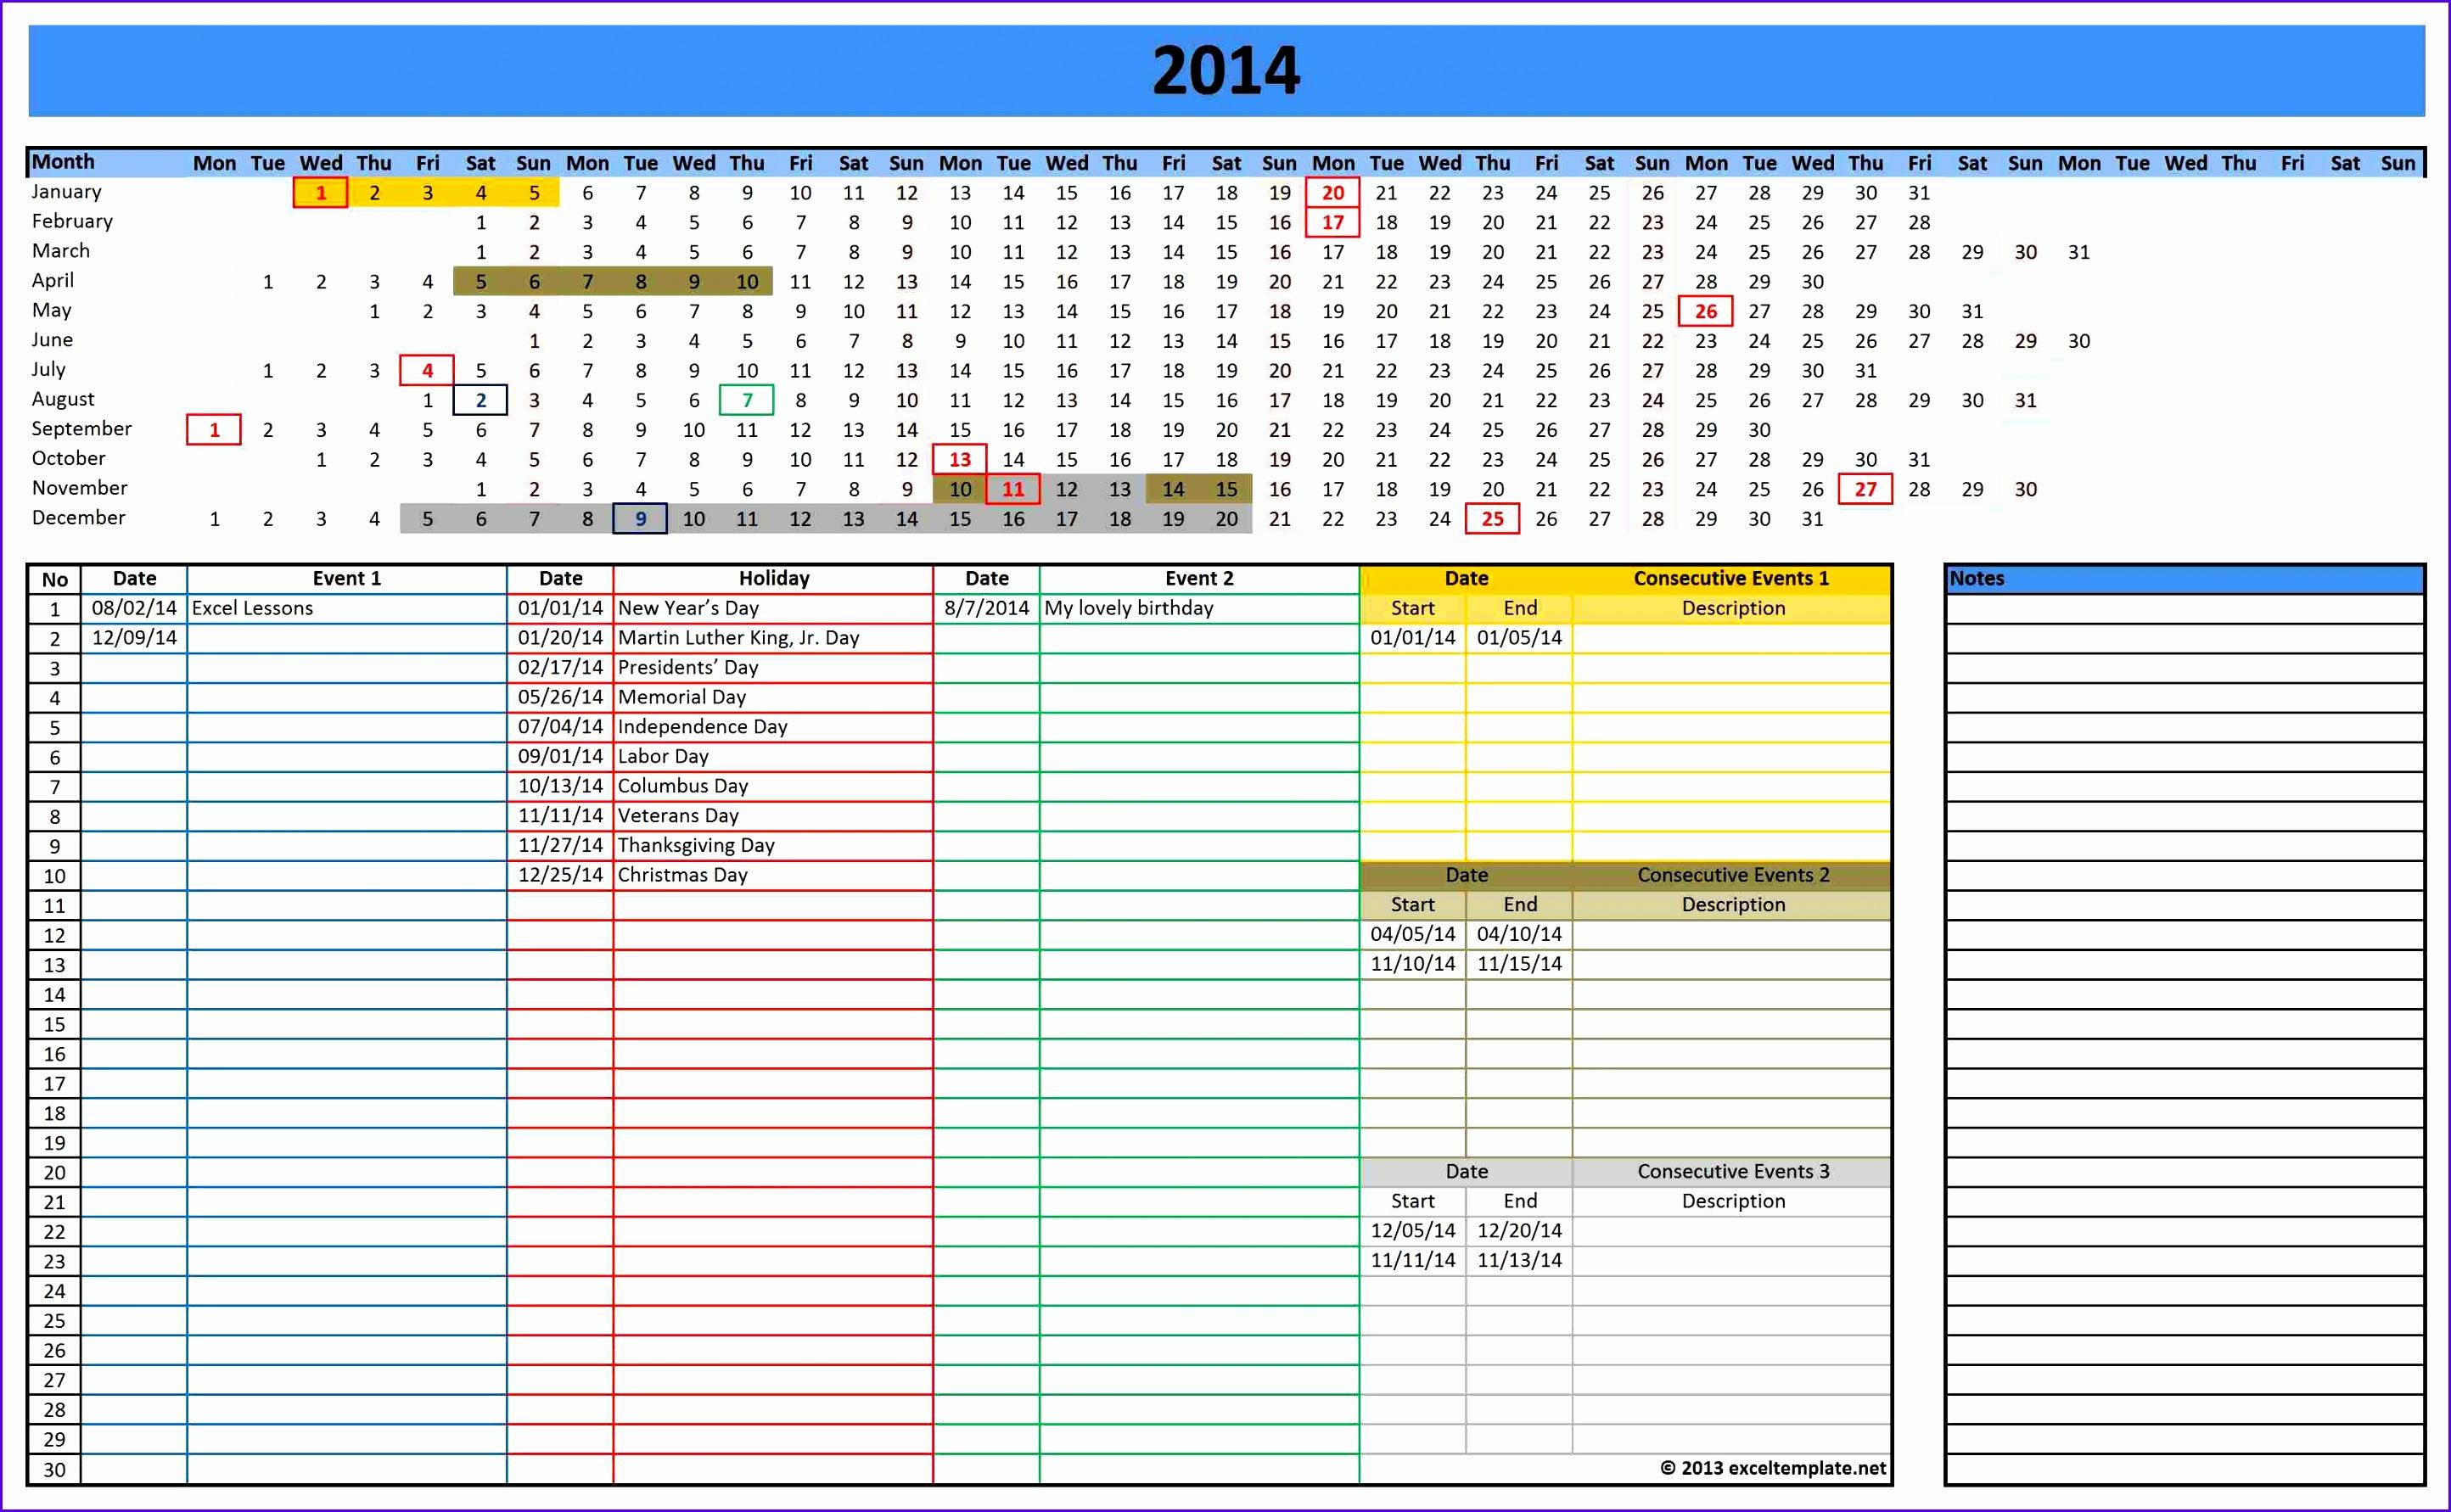 10 template excel calendar exceltemplates exceltemplates 2014 calendar excel template dalarcon 28881782 publicscrutiny Images